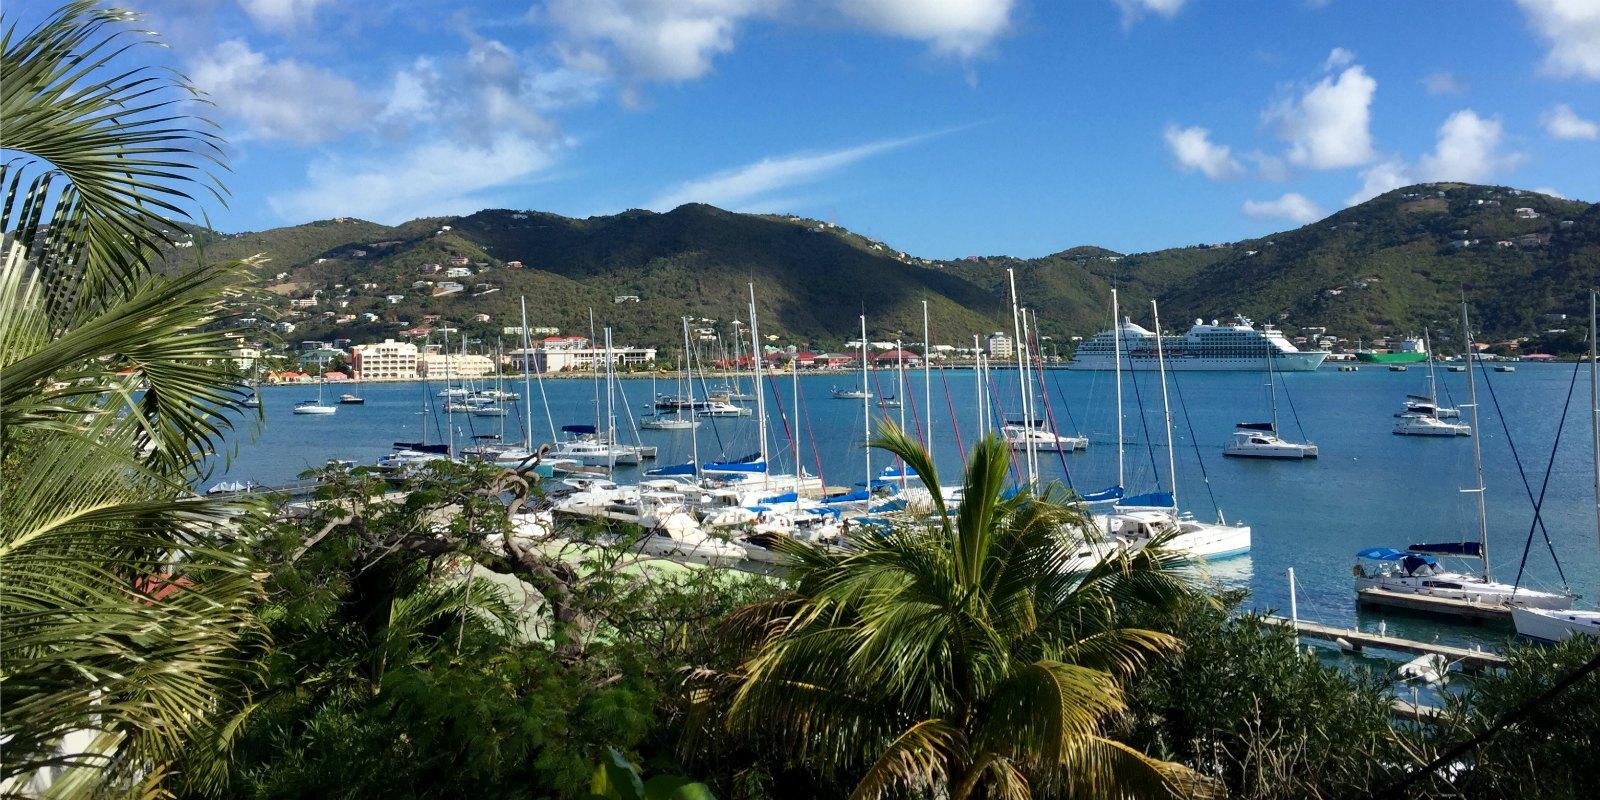 British Virgin Islands corruption scandal threatens its dependable tax haven reputation